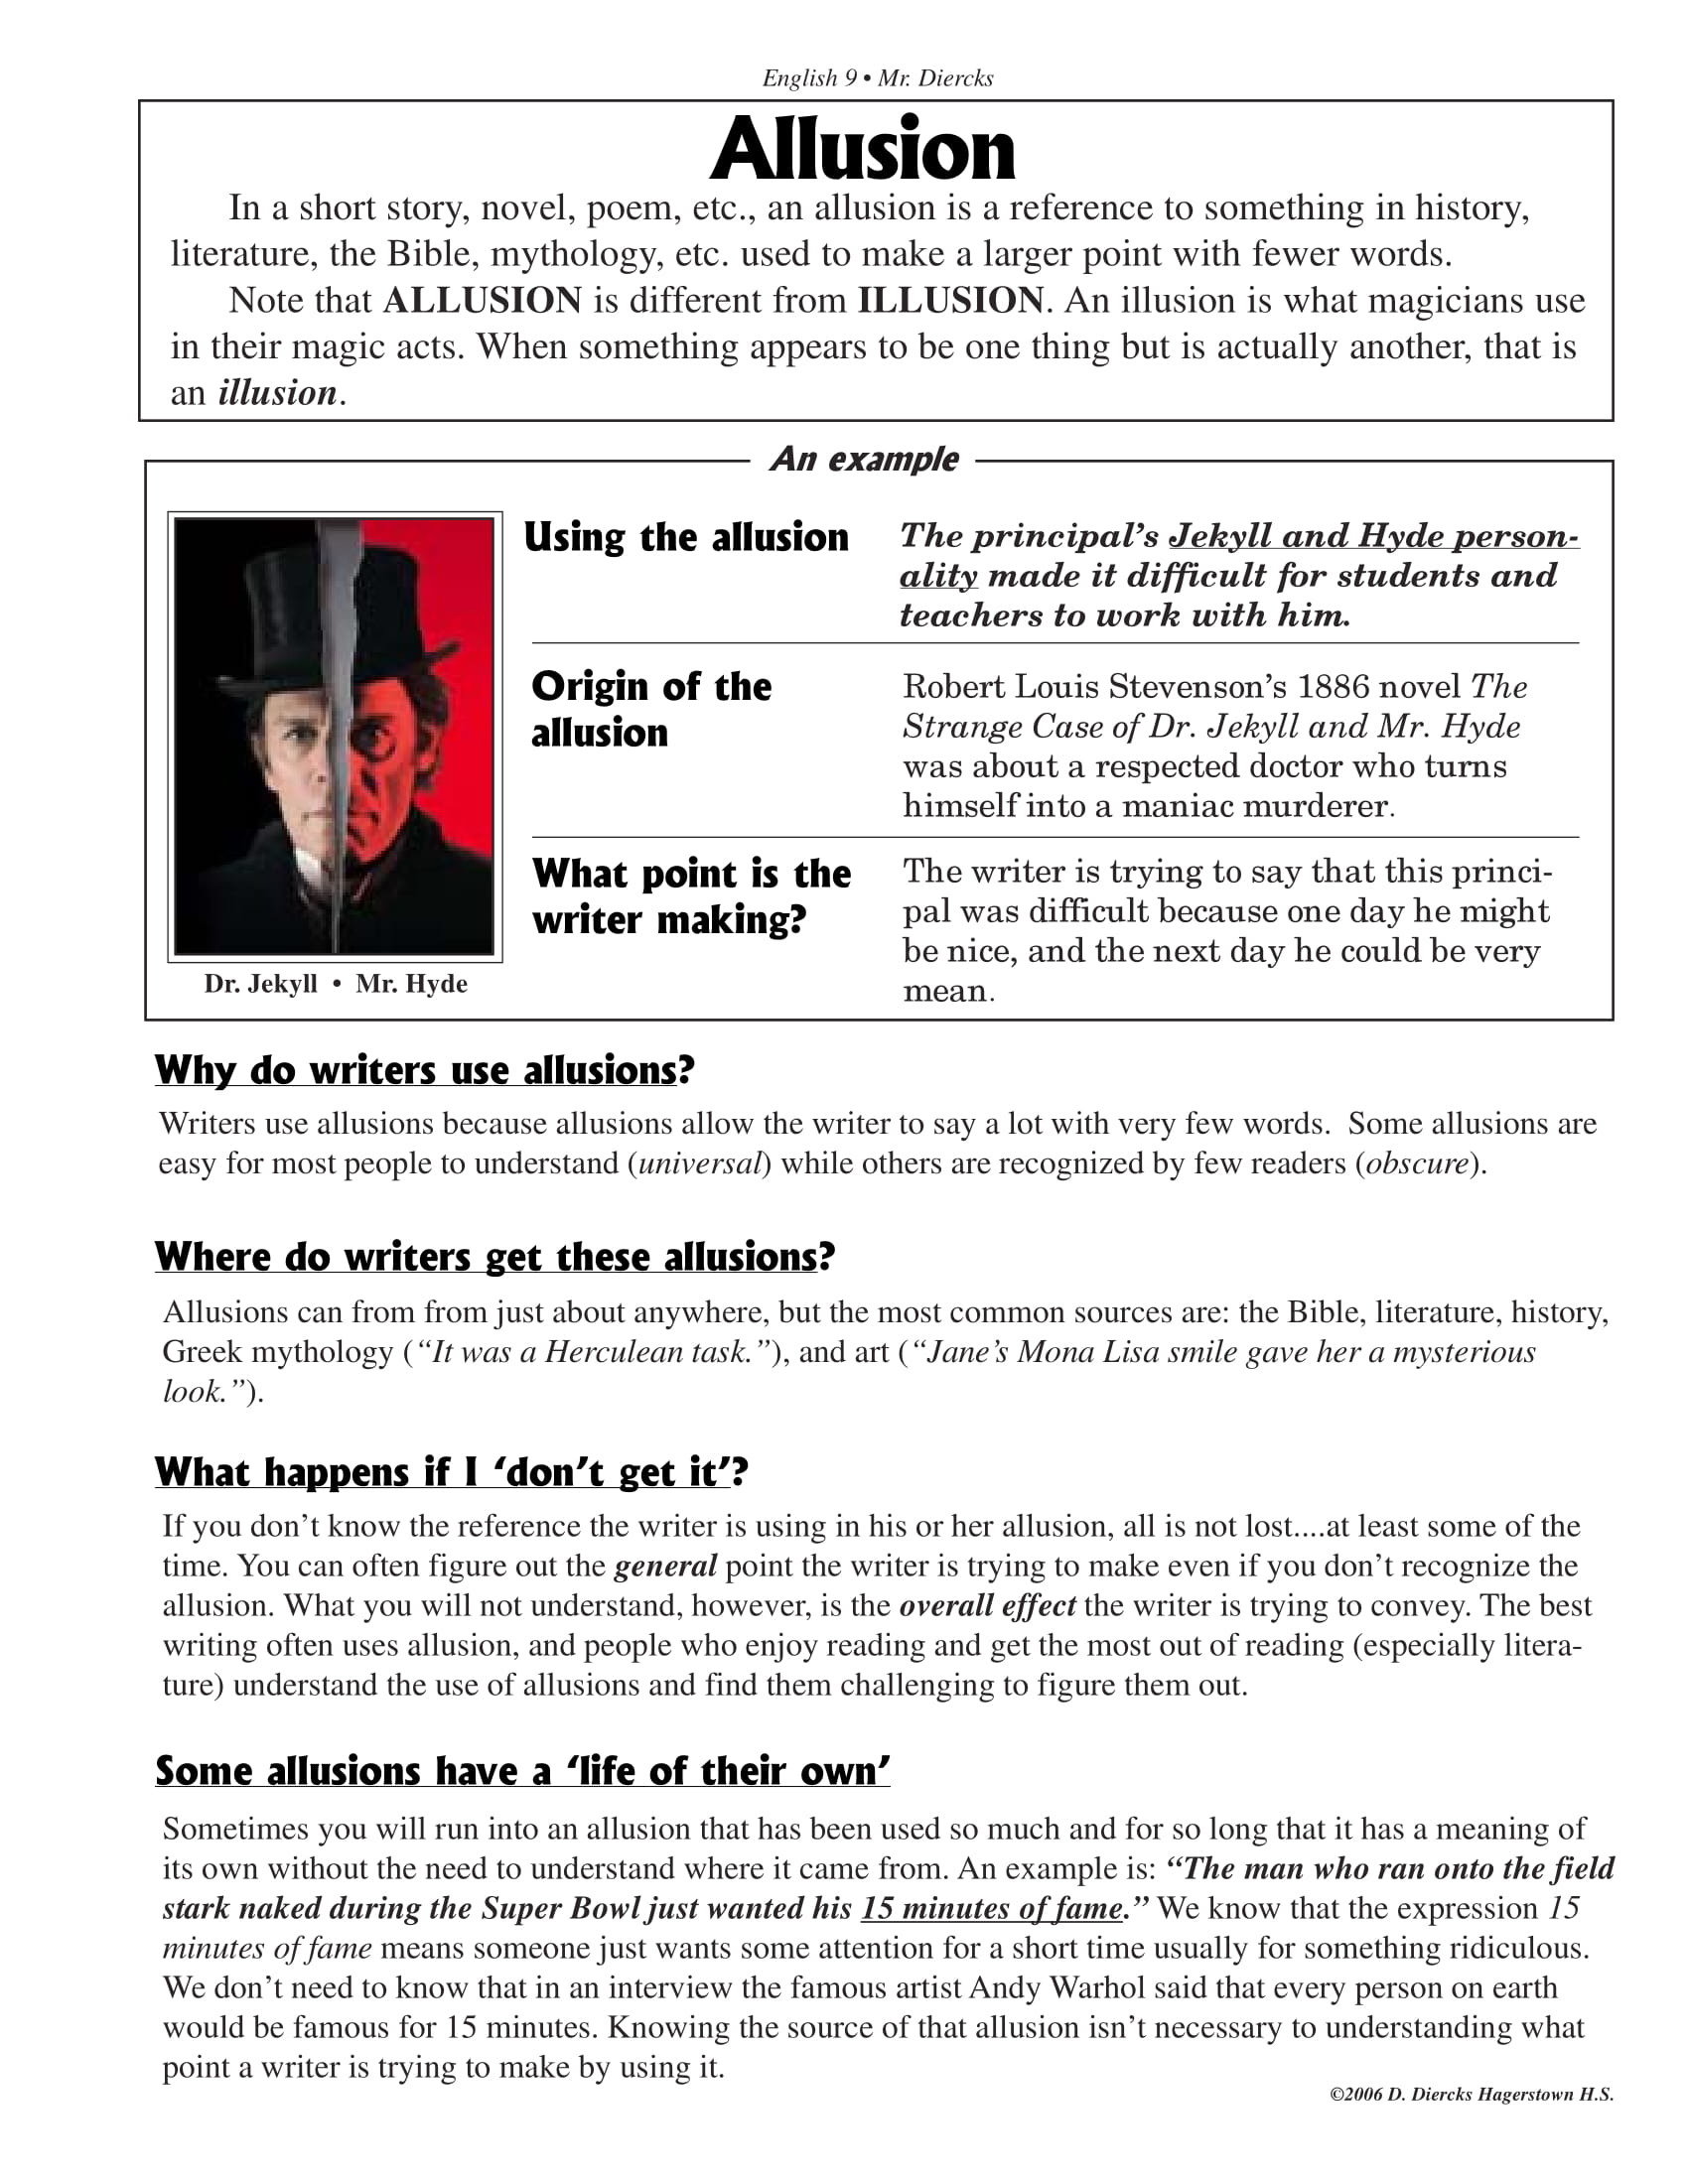 20 Allusion Examples